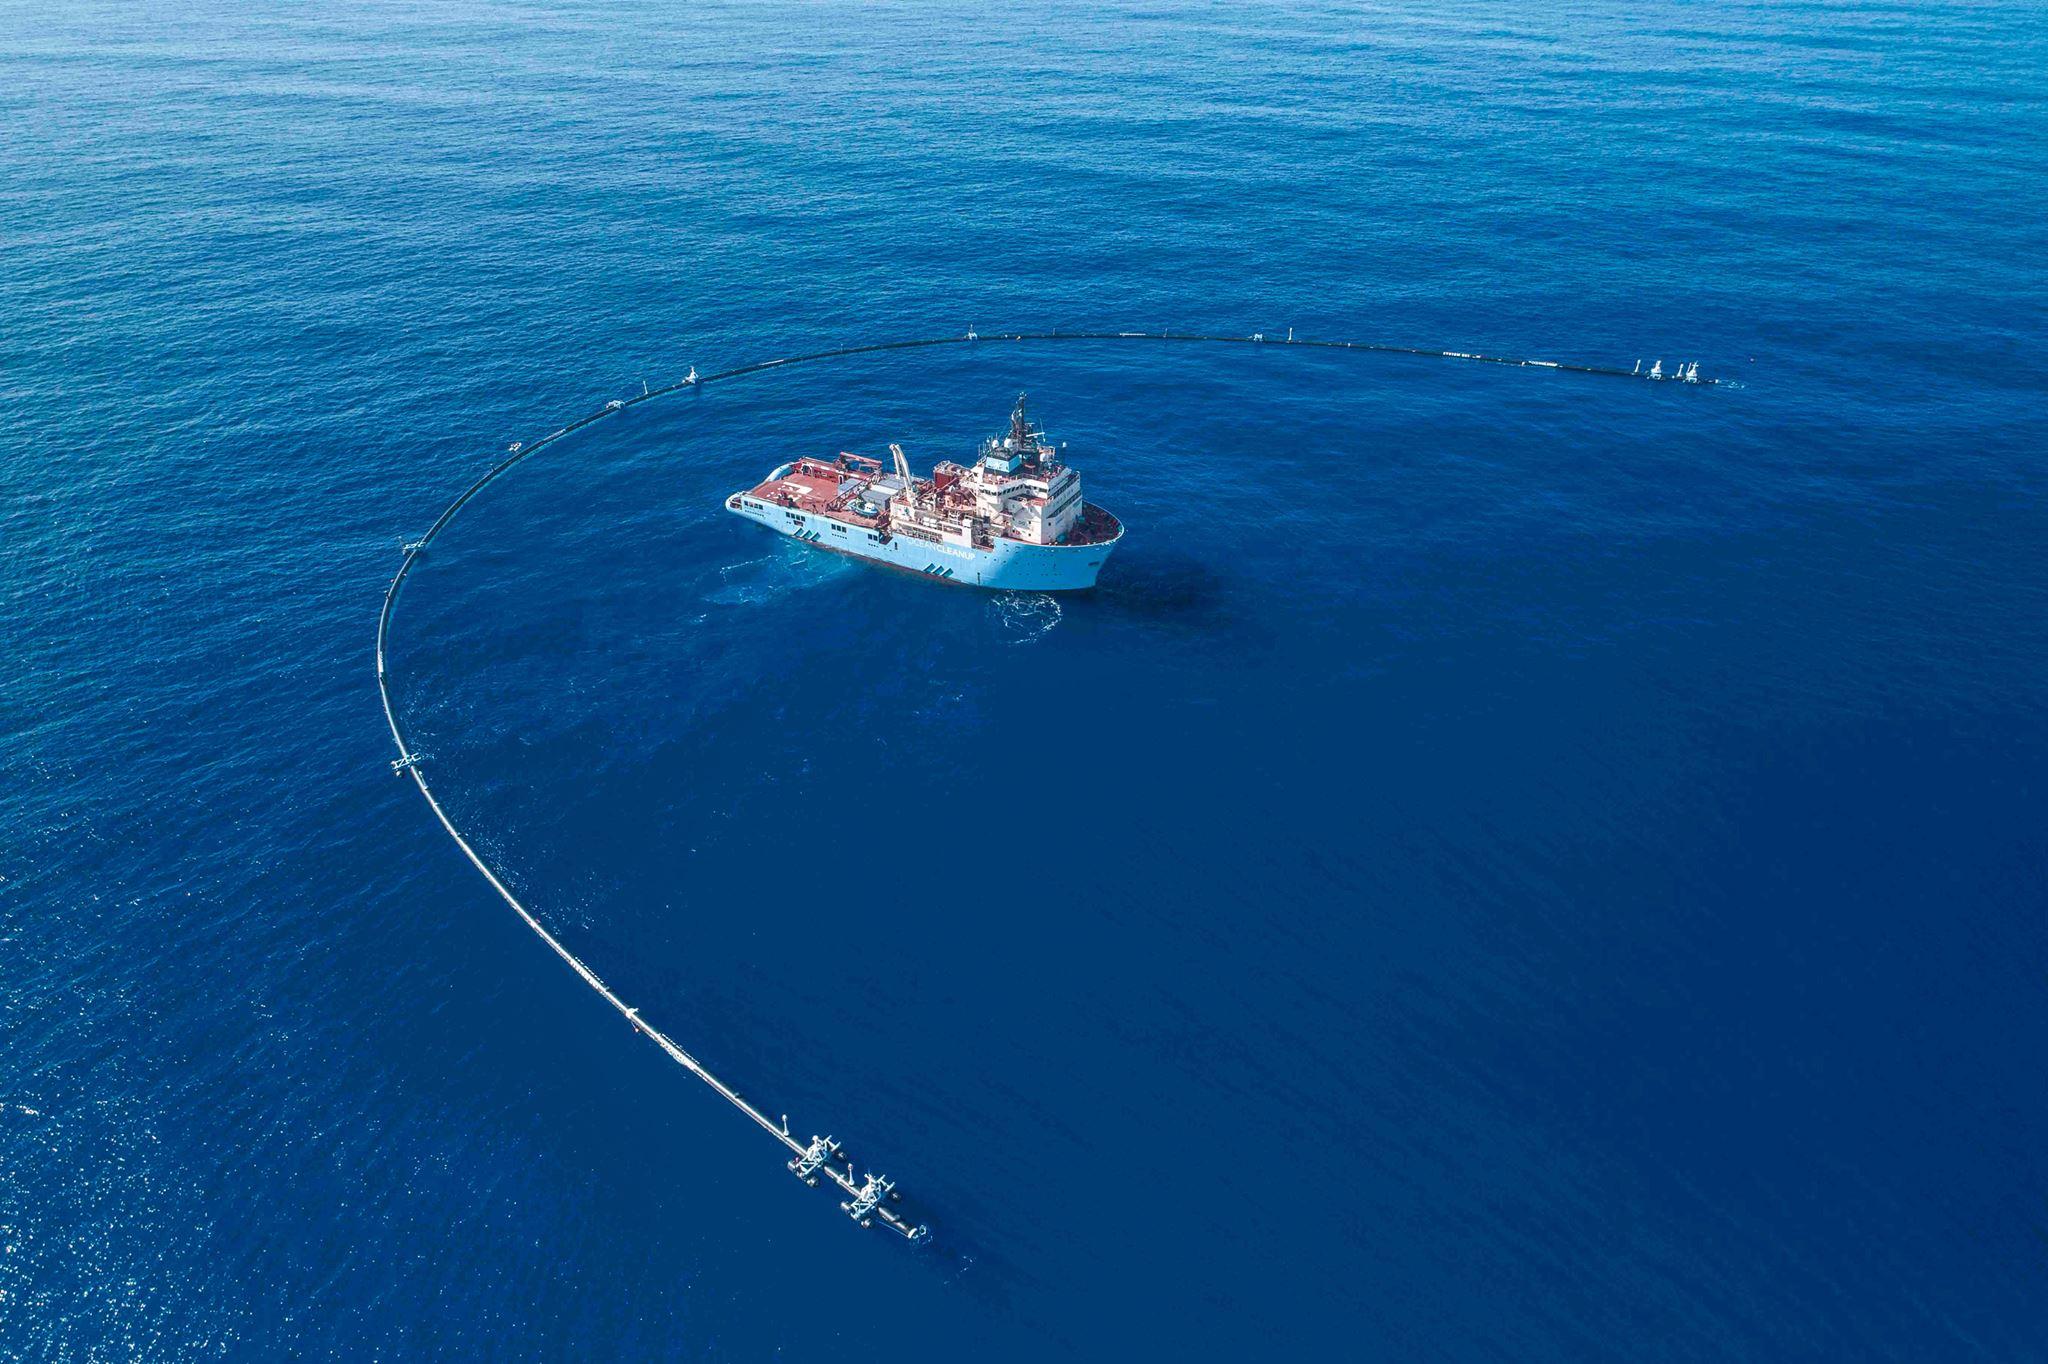 Se inició la travesía del Ocean Cleanup